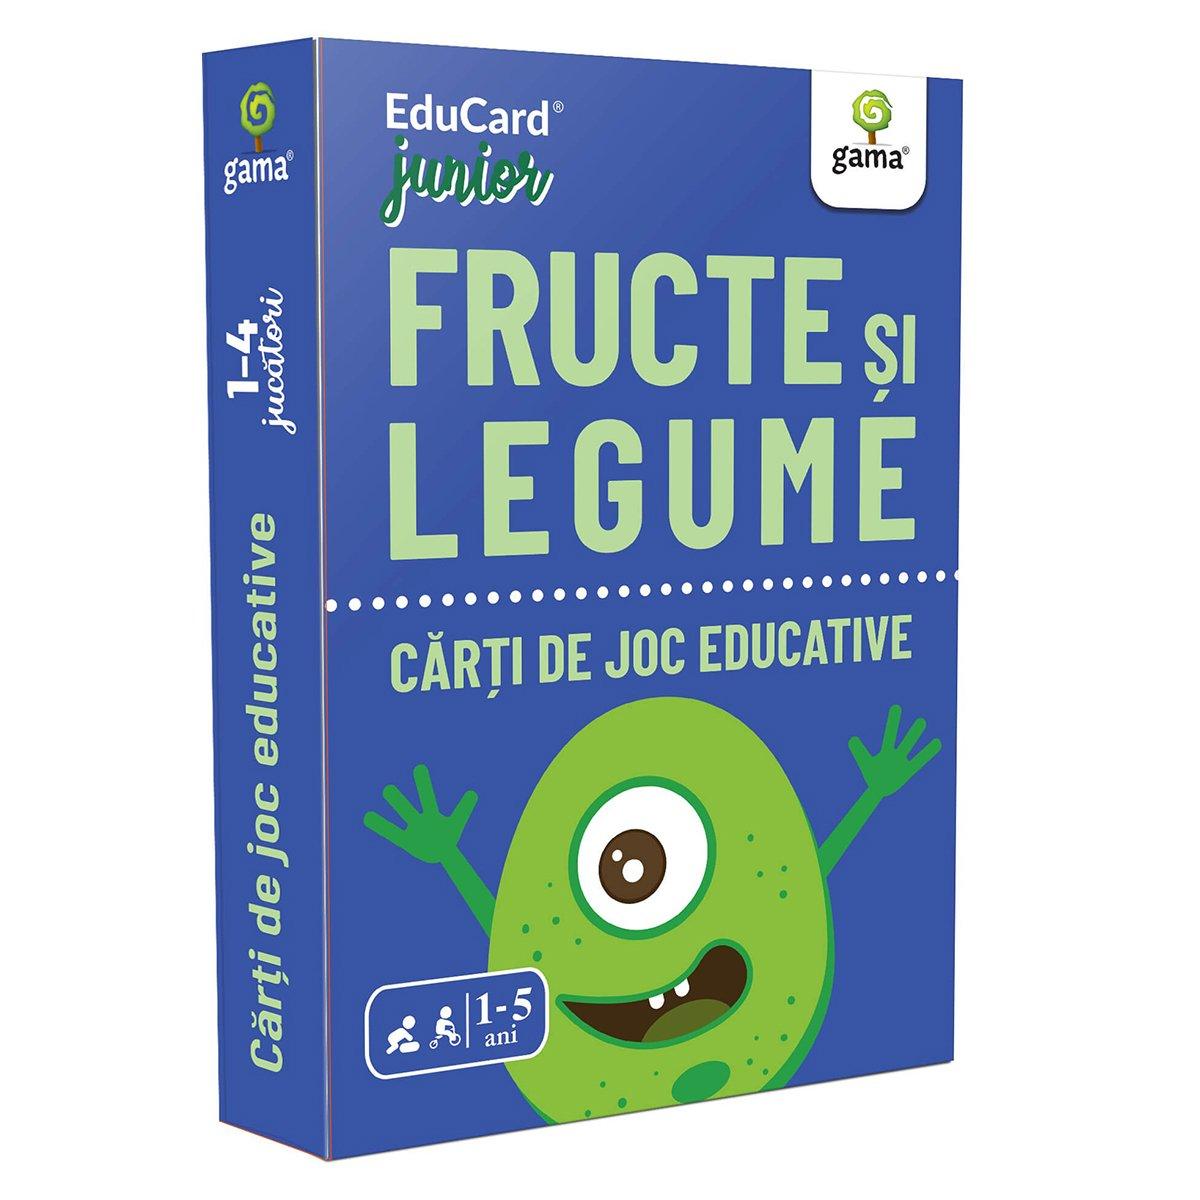 Editura Gama, Carti de joc educative Junior, Fructe si legume